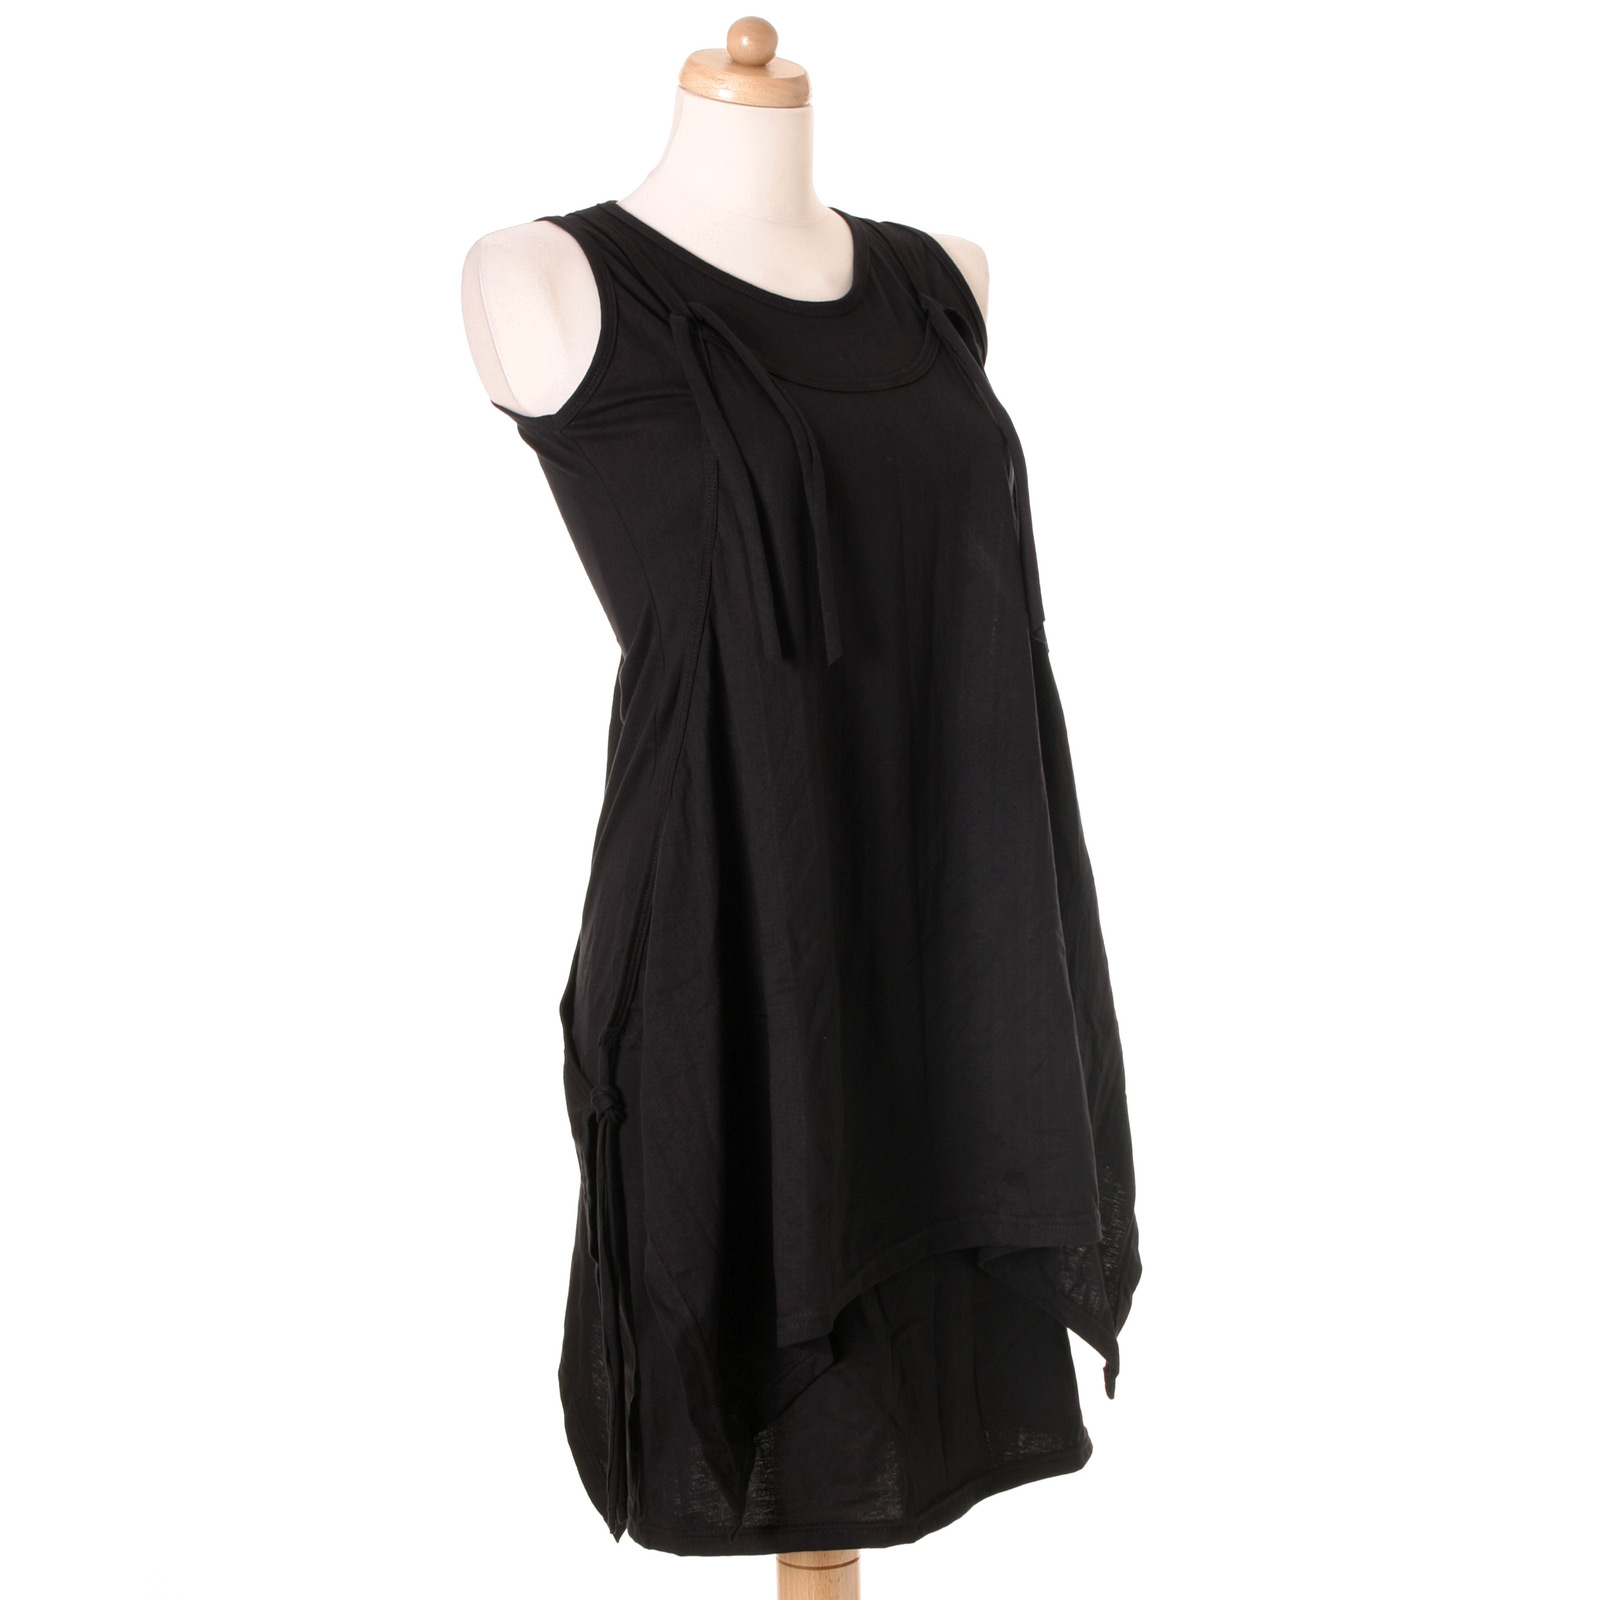 vishes lagenlook kleid zipfel dress elfen ethno chic hippie sommerkleid tunika ebay. Black Bedroom Furniture Sets. Home Design Ideas